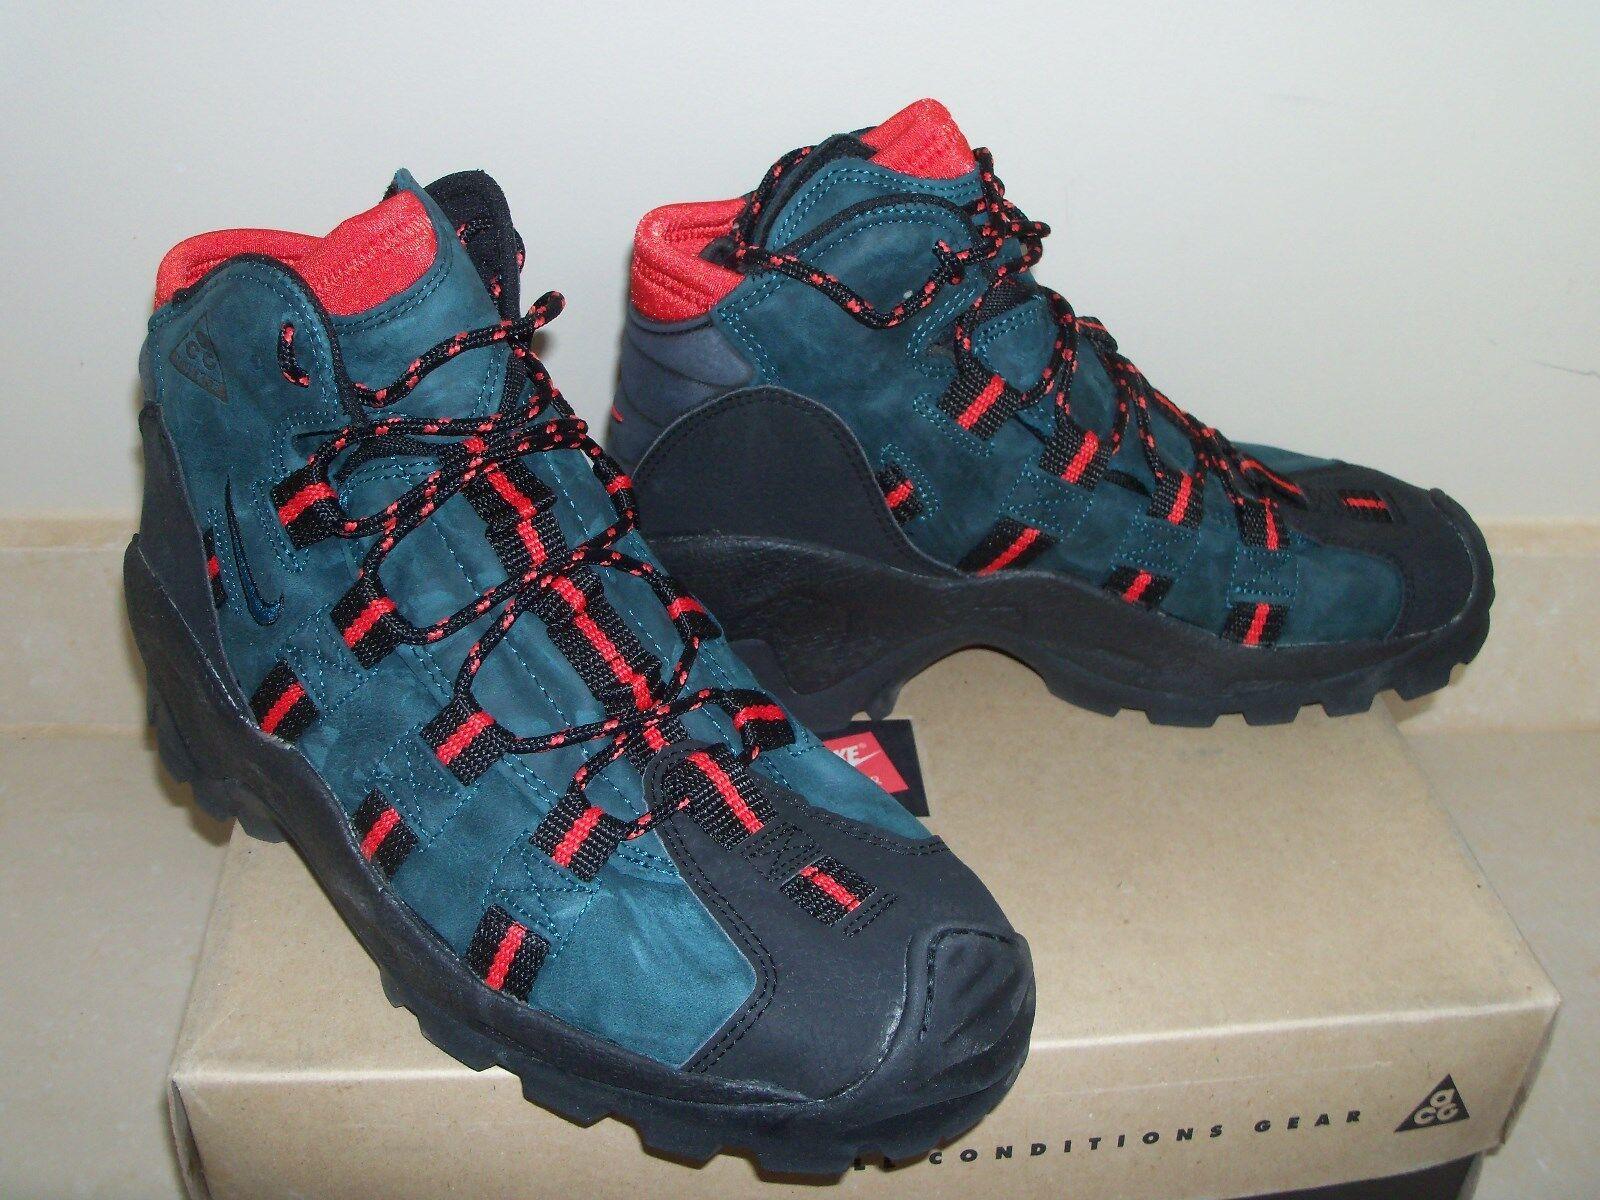 1995 OG Nike AIR RATIC vintage ACG Sneaker NEW Sz: 9 Blk/Night Shade